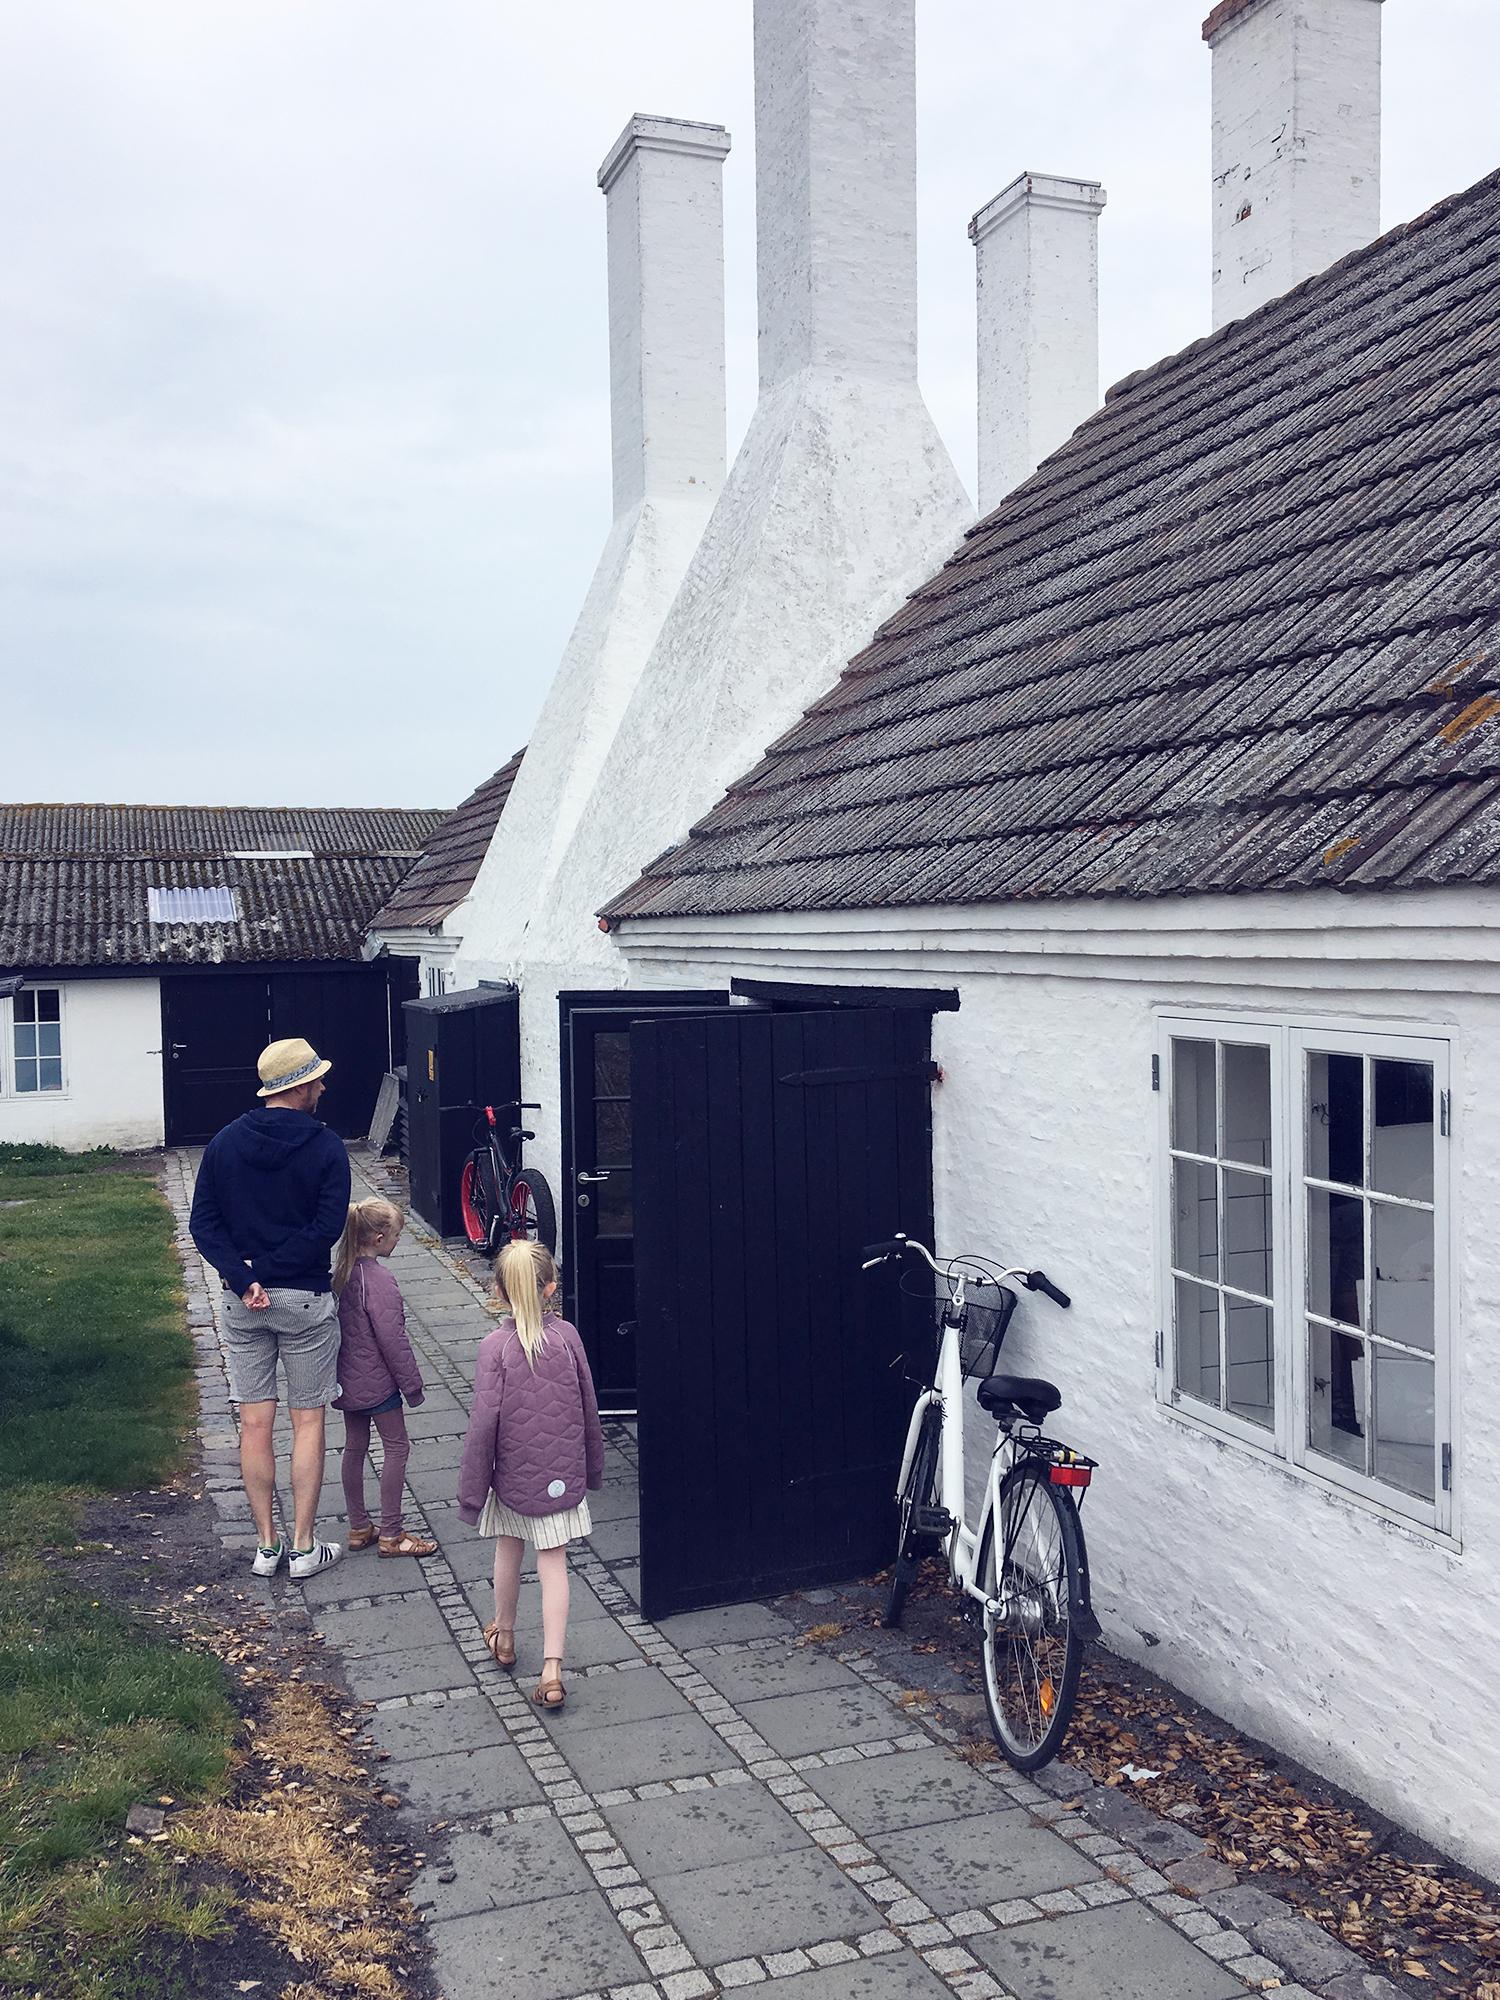 guide små byer bornholm Hasle røgeri